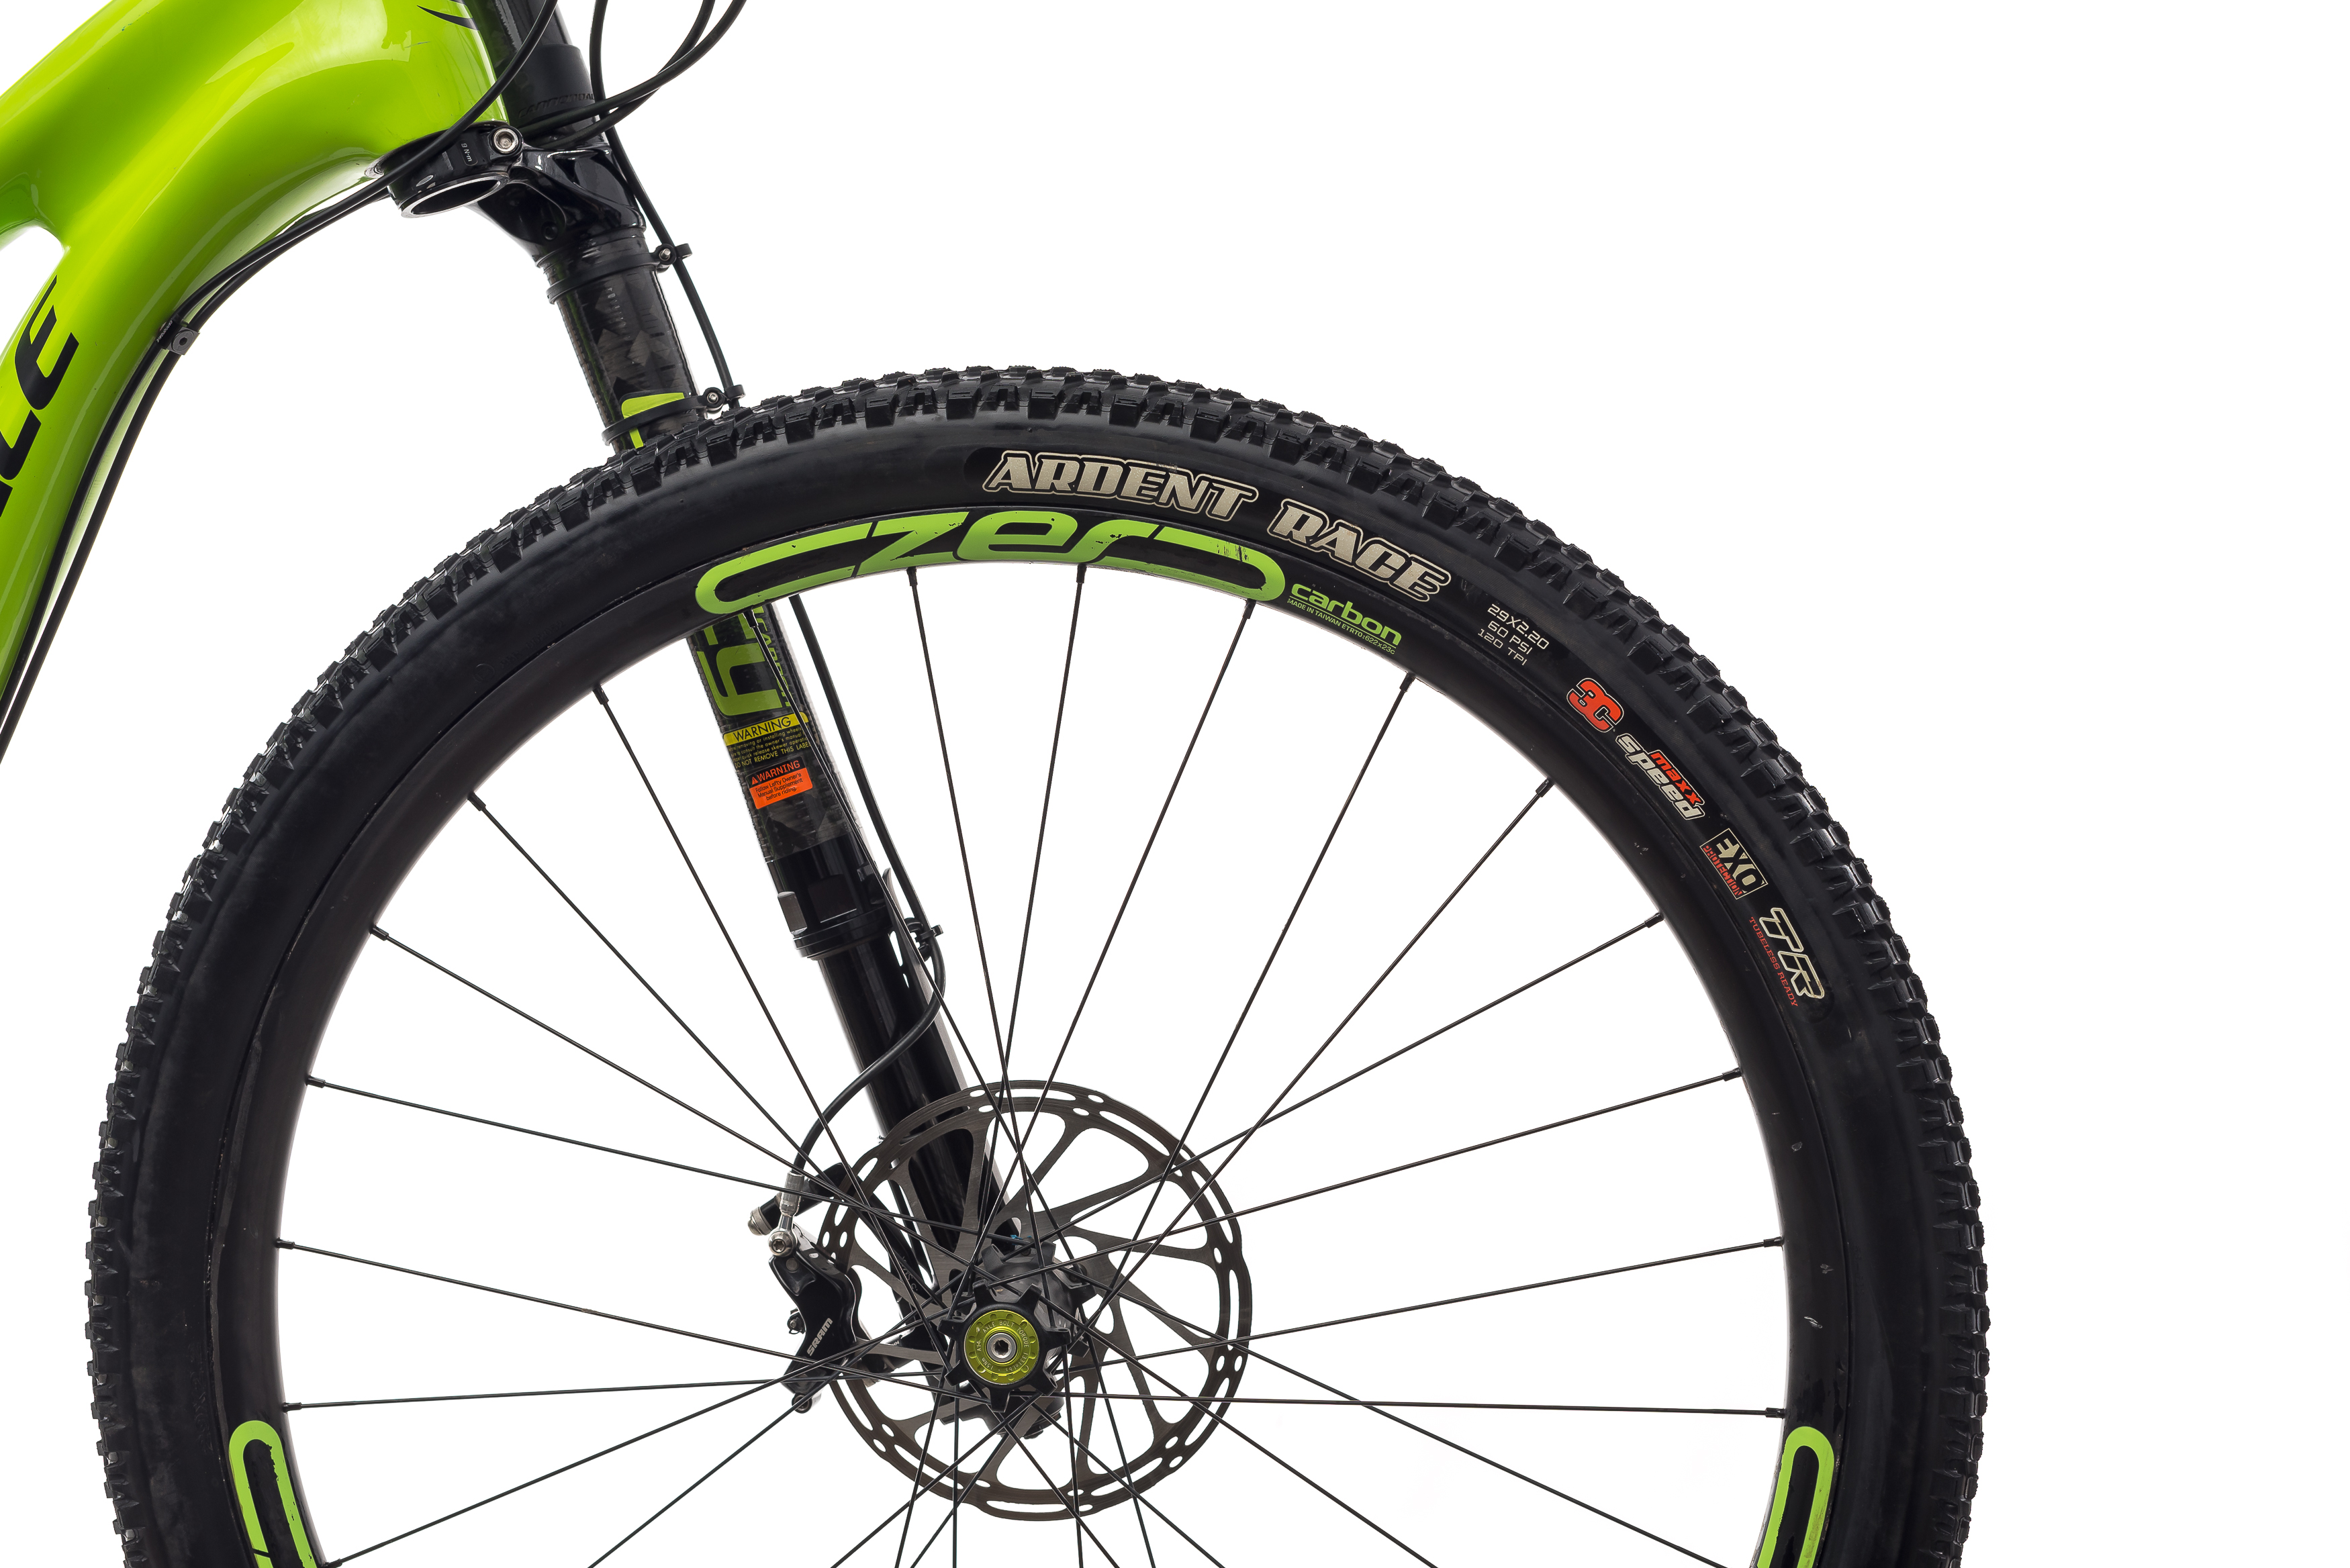 1e20427a3ec 2016 Cannondale Scalpel 29 Carbon Race Mountain Bike Small 29